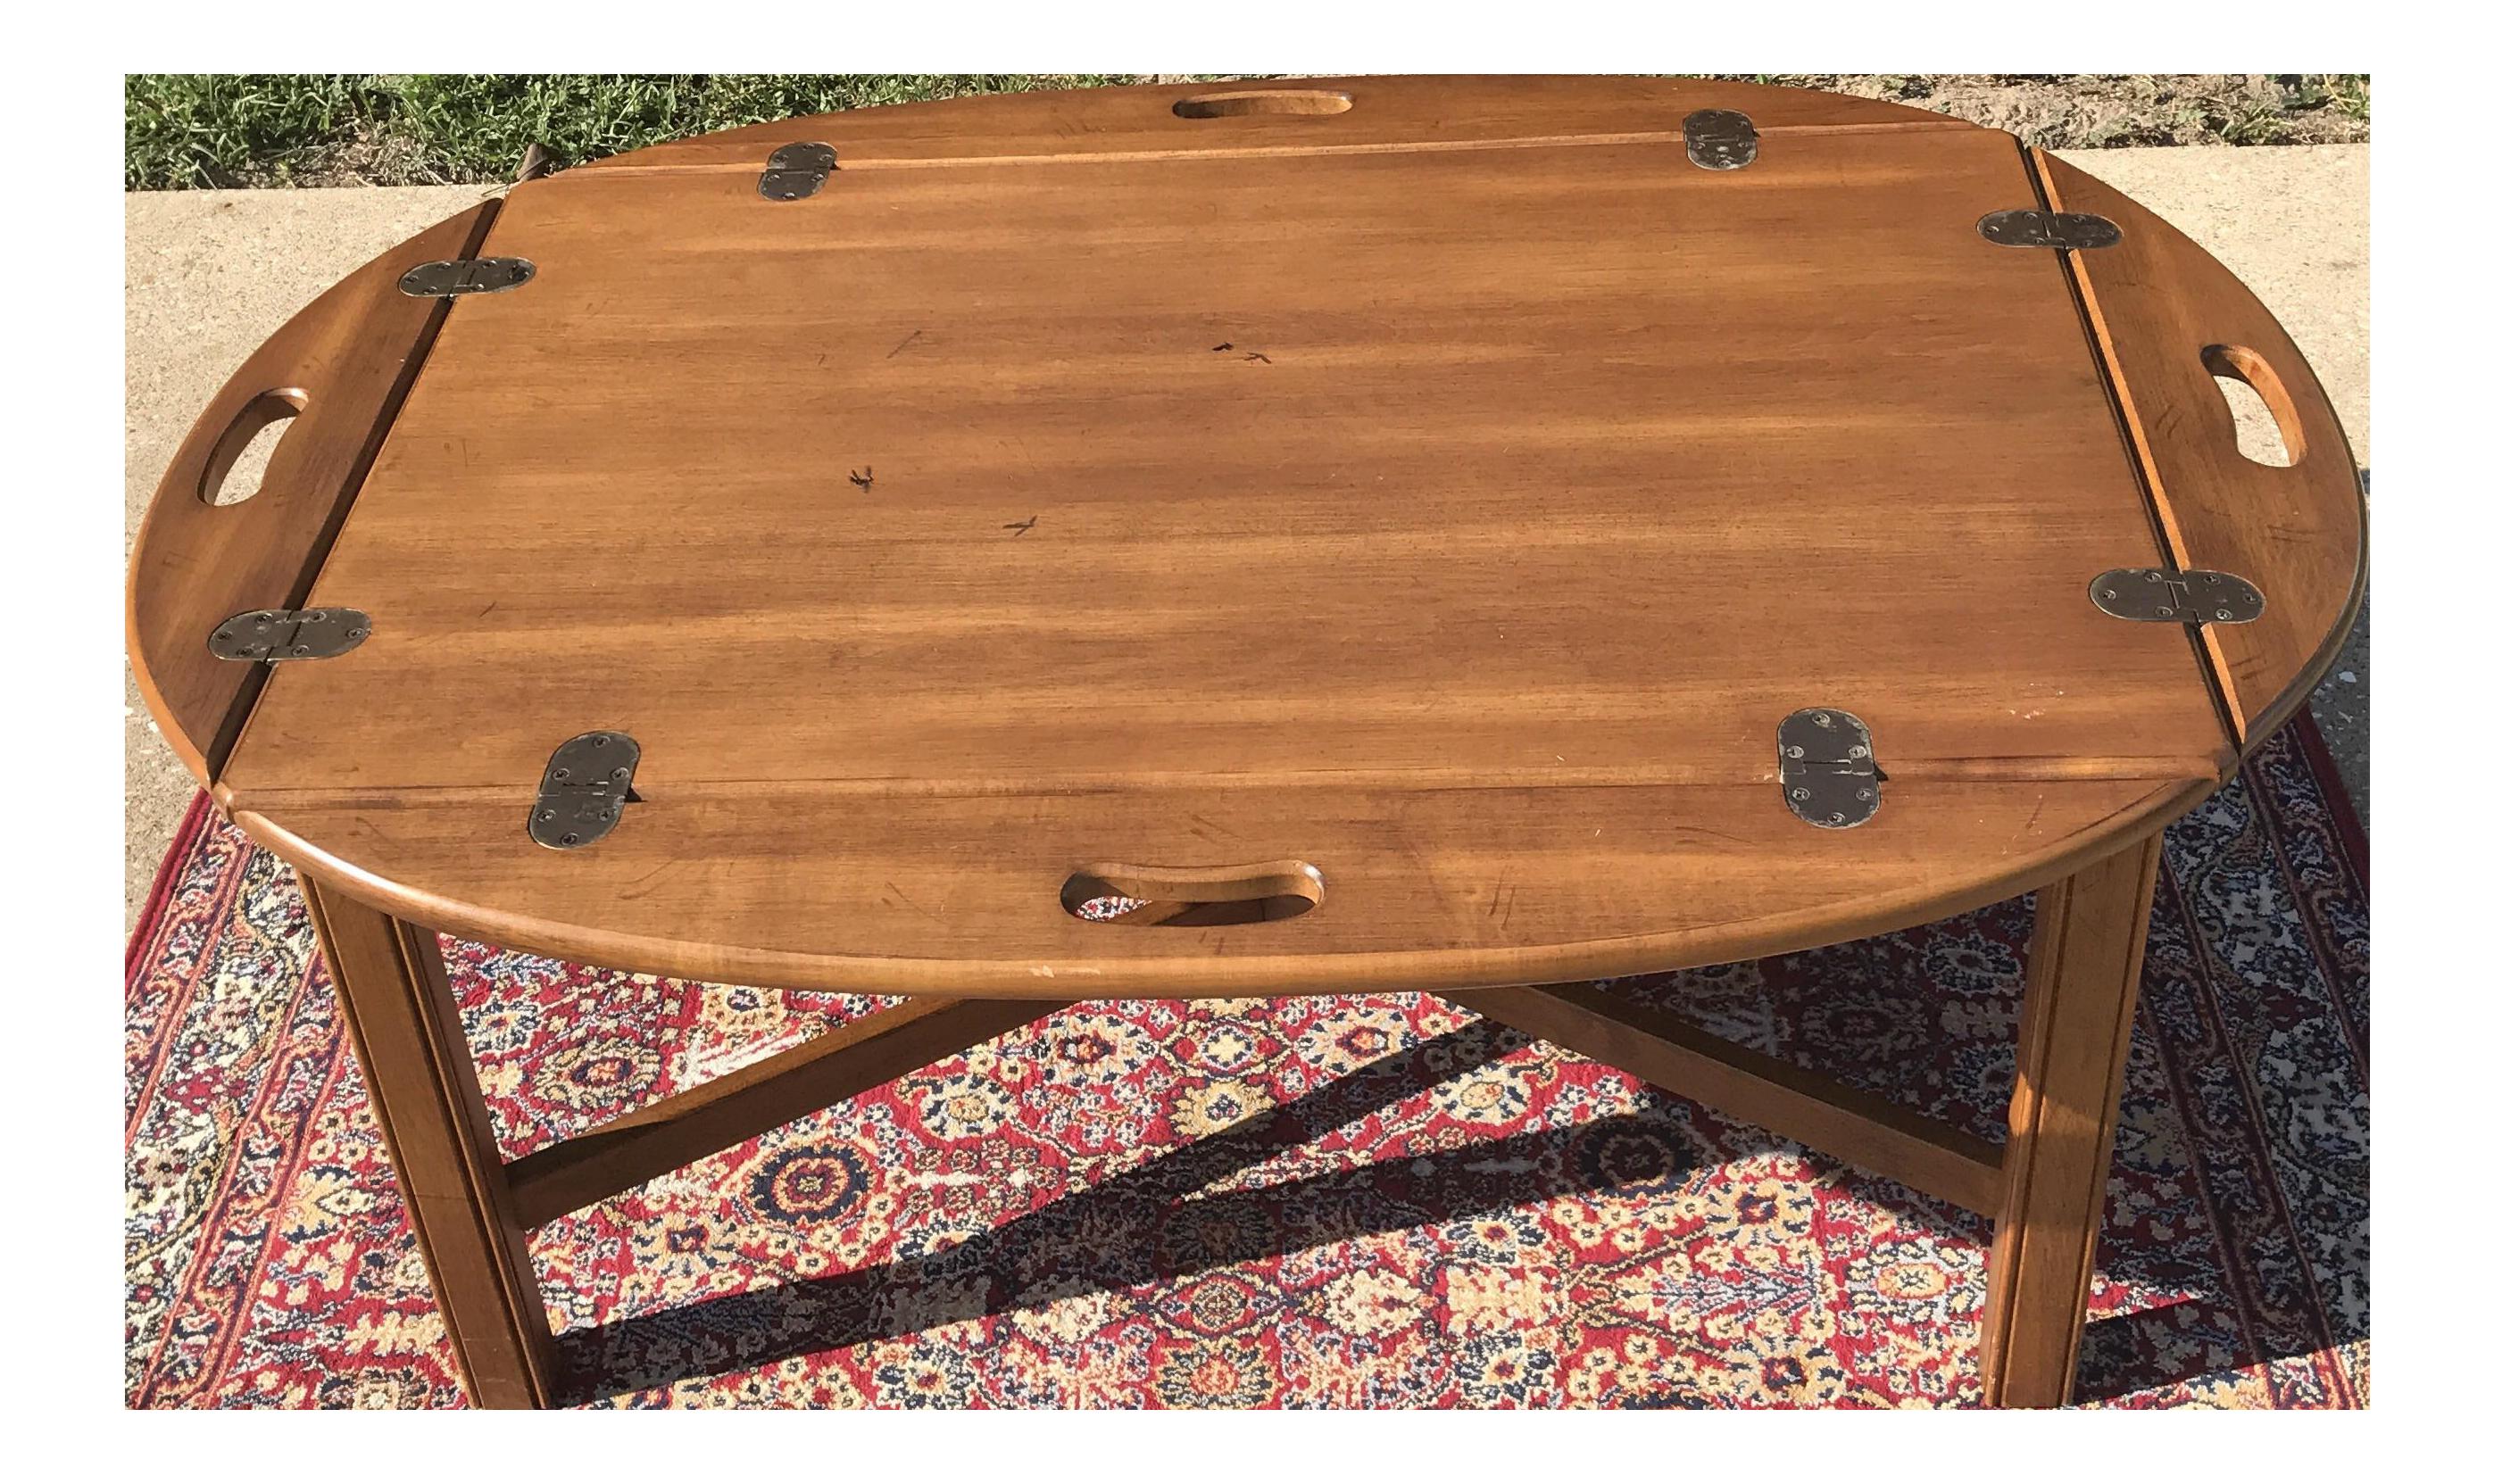 Vintage Ethan Allen Butler s Tray Coffee Table